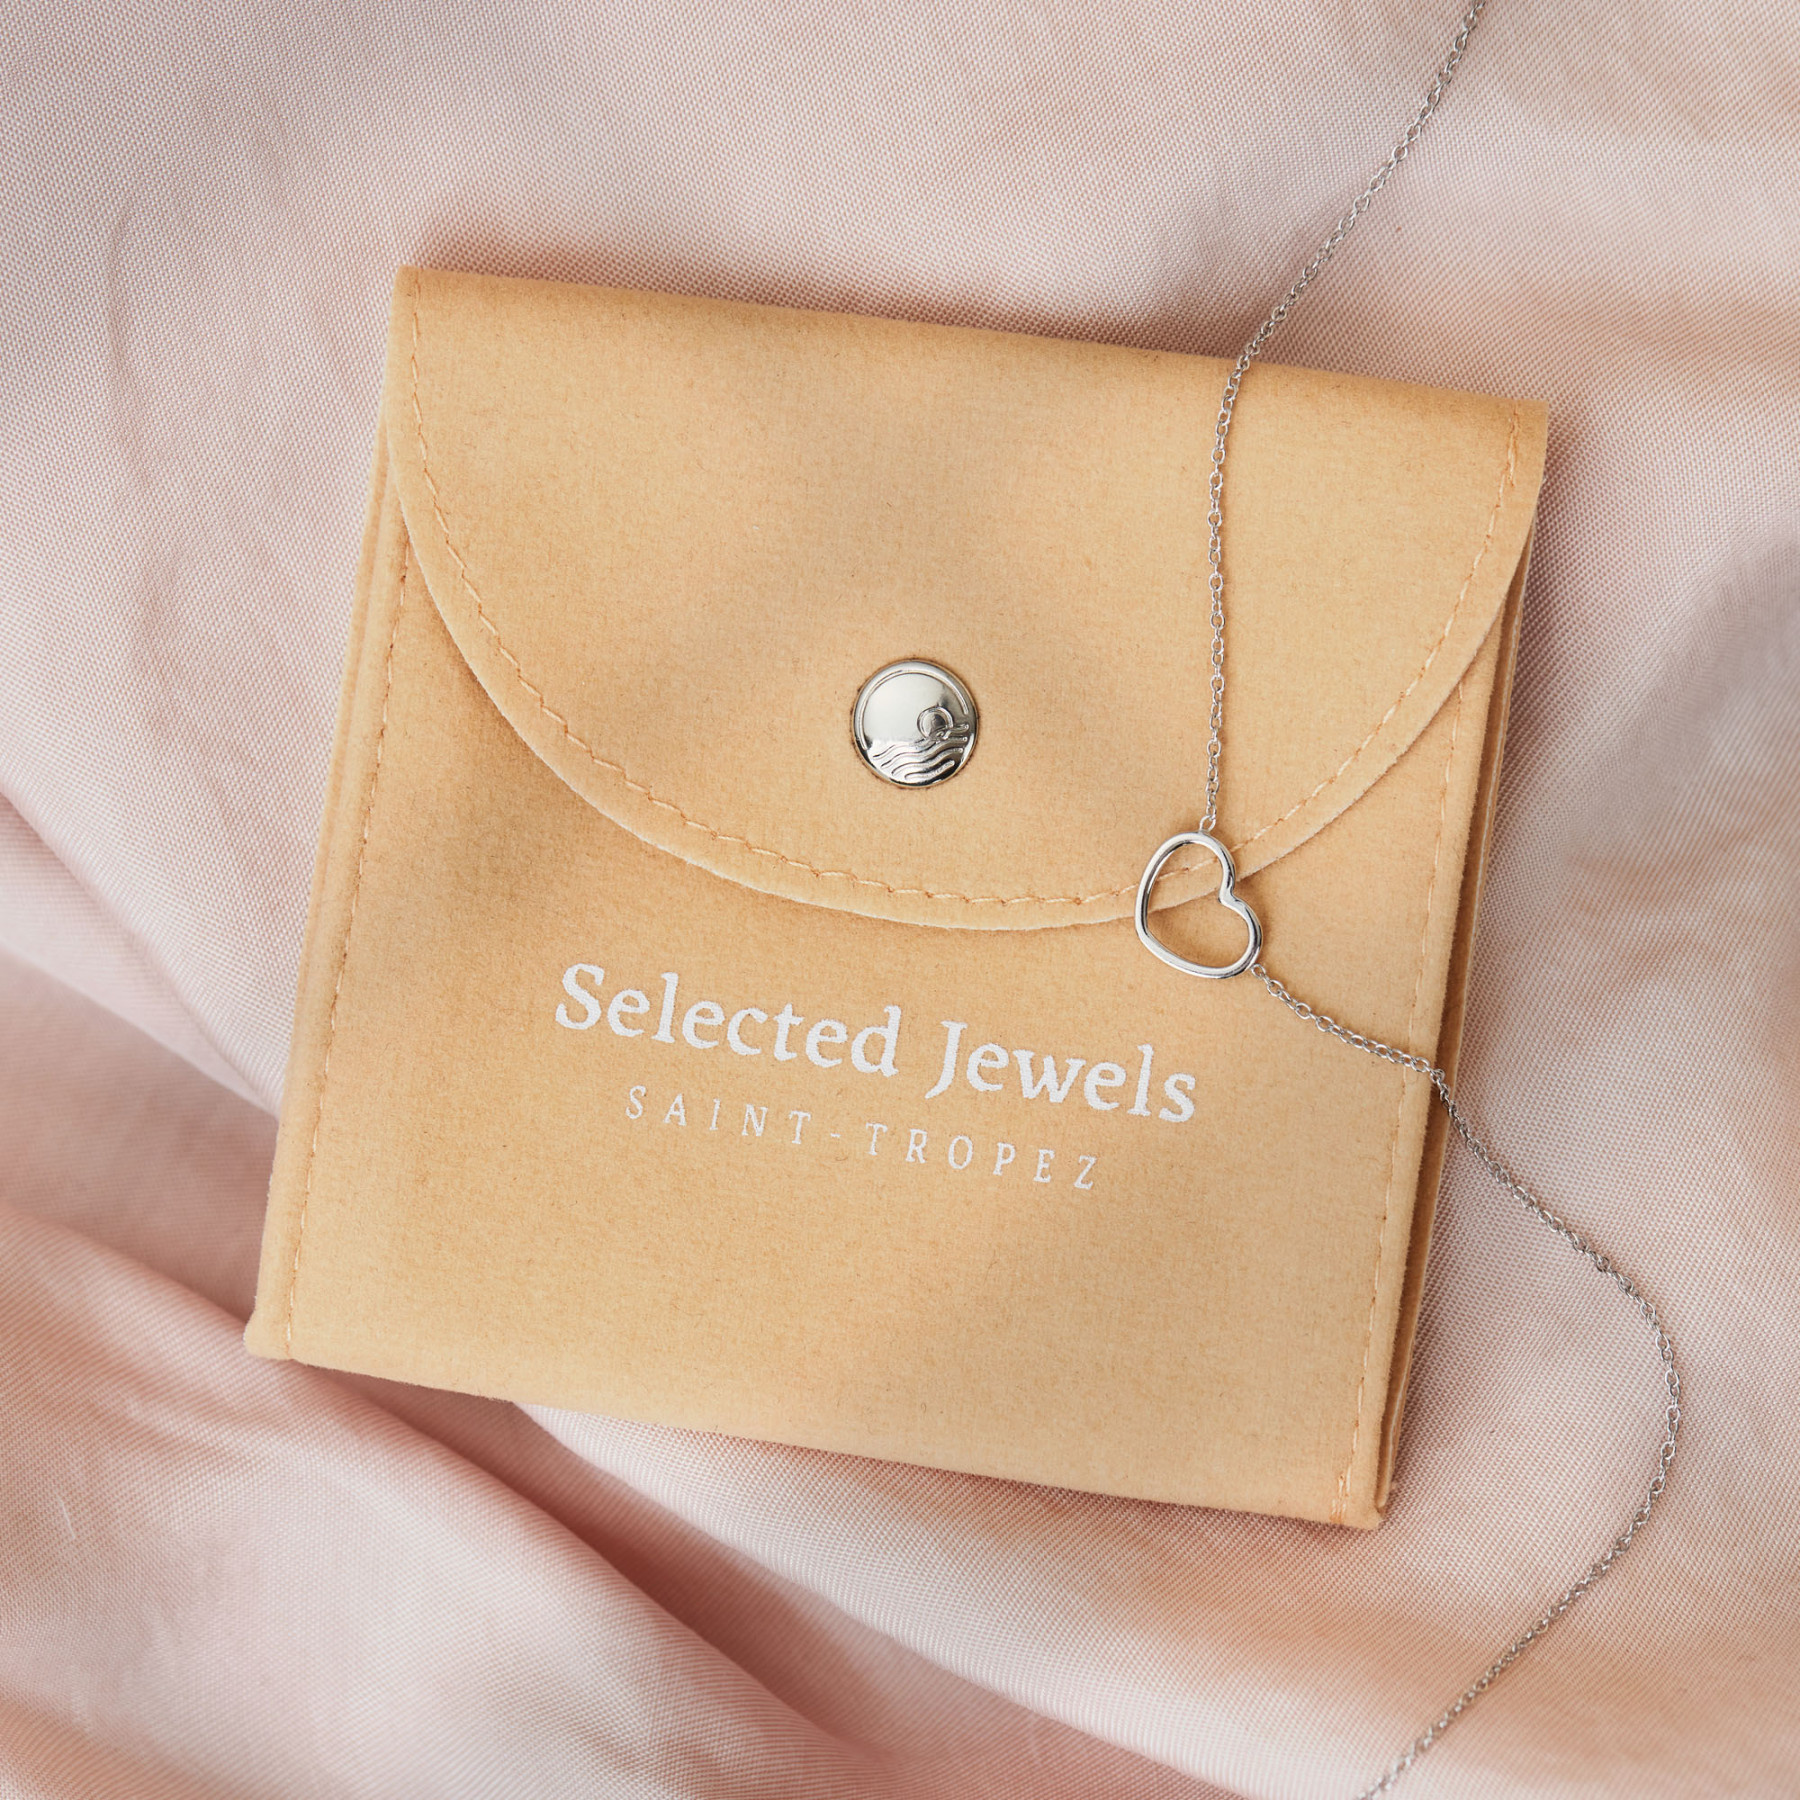 Selected Jewels Julie Théa creoler i 925 sterling silver